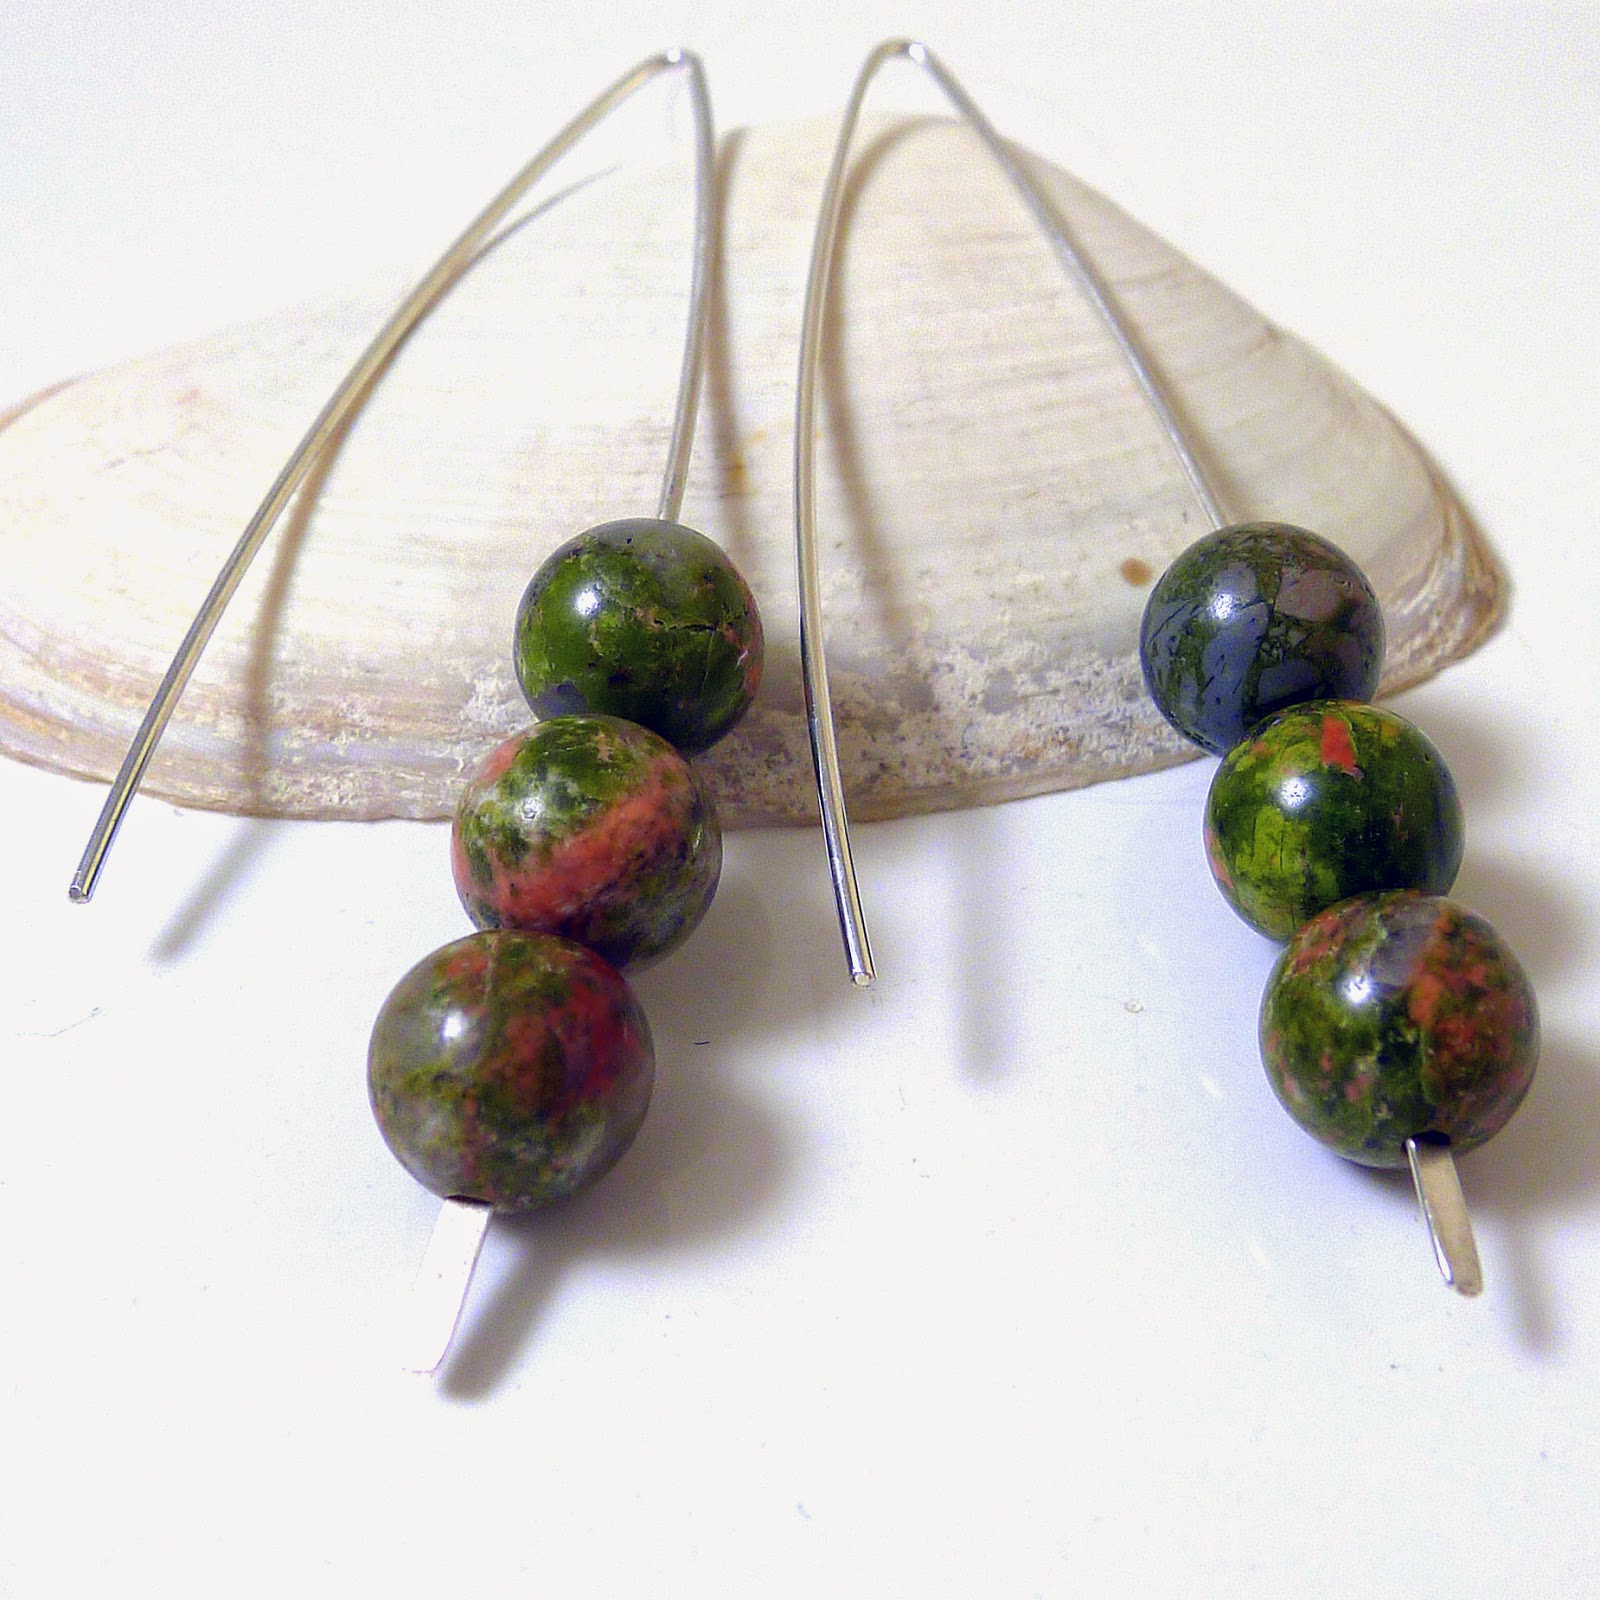 http://www.shazzabethcreations.co.nz/#!product/prd1/2485497961/unakite-v-style-earrings